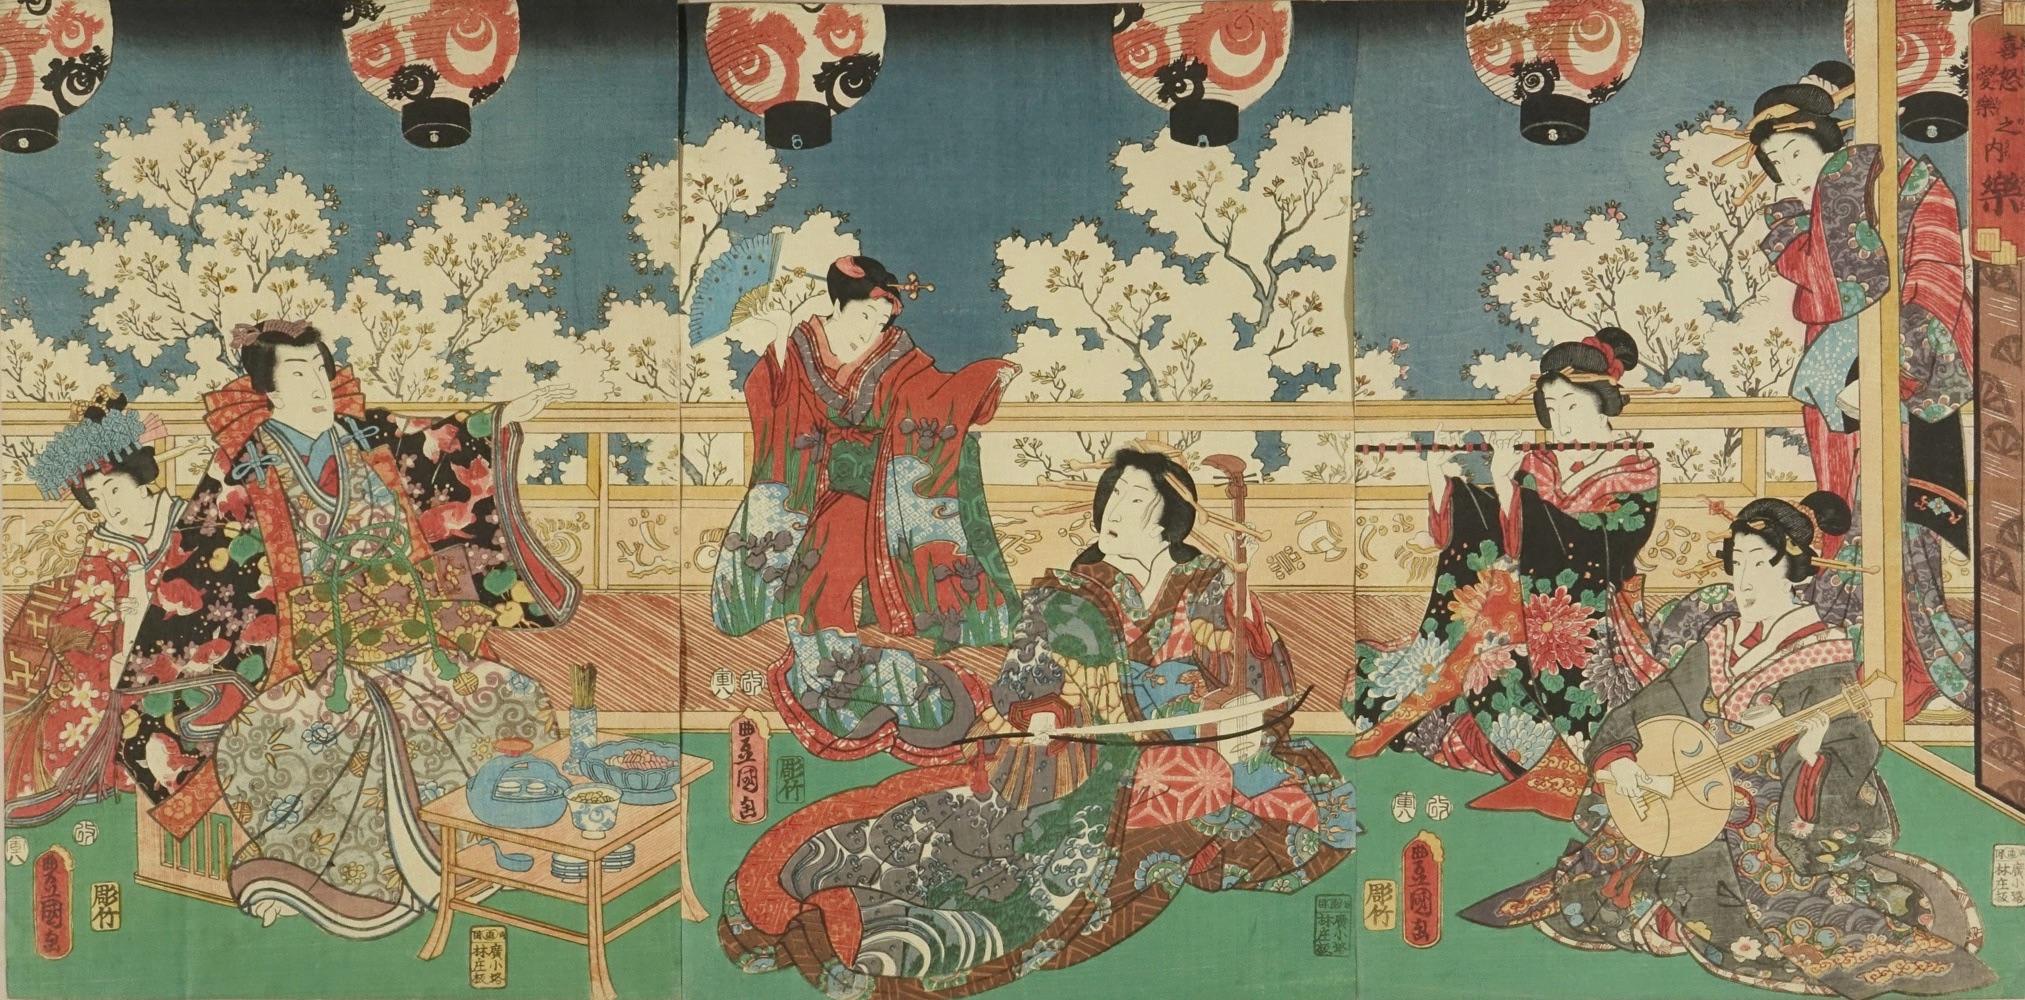 TOYOKUNI III Beauties and Genii on a terrace overlooking cherry blossom, subtitled <i>Raku</i> (Pleasure), from <i>Kidoairaku no uchi</i> (Four emotions), triptych